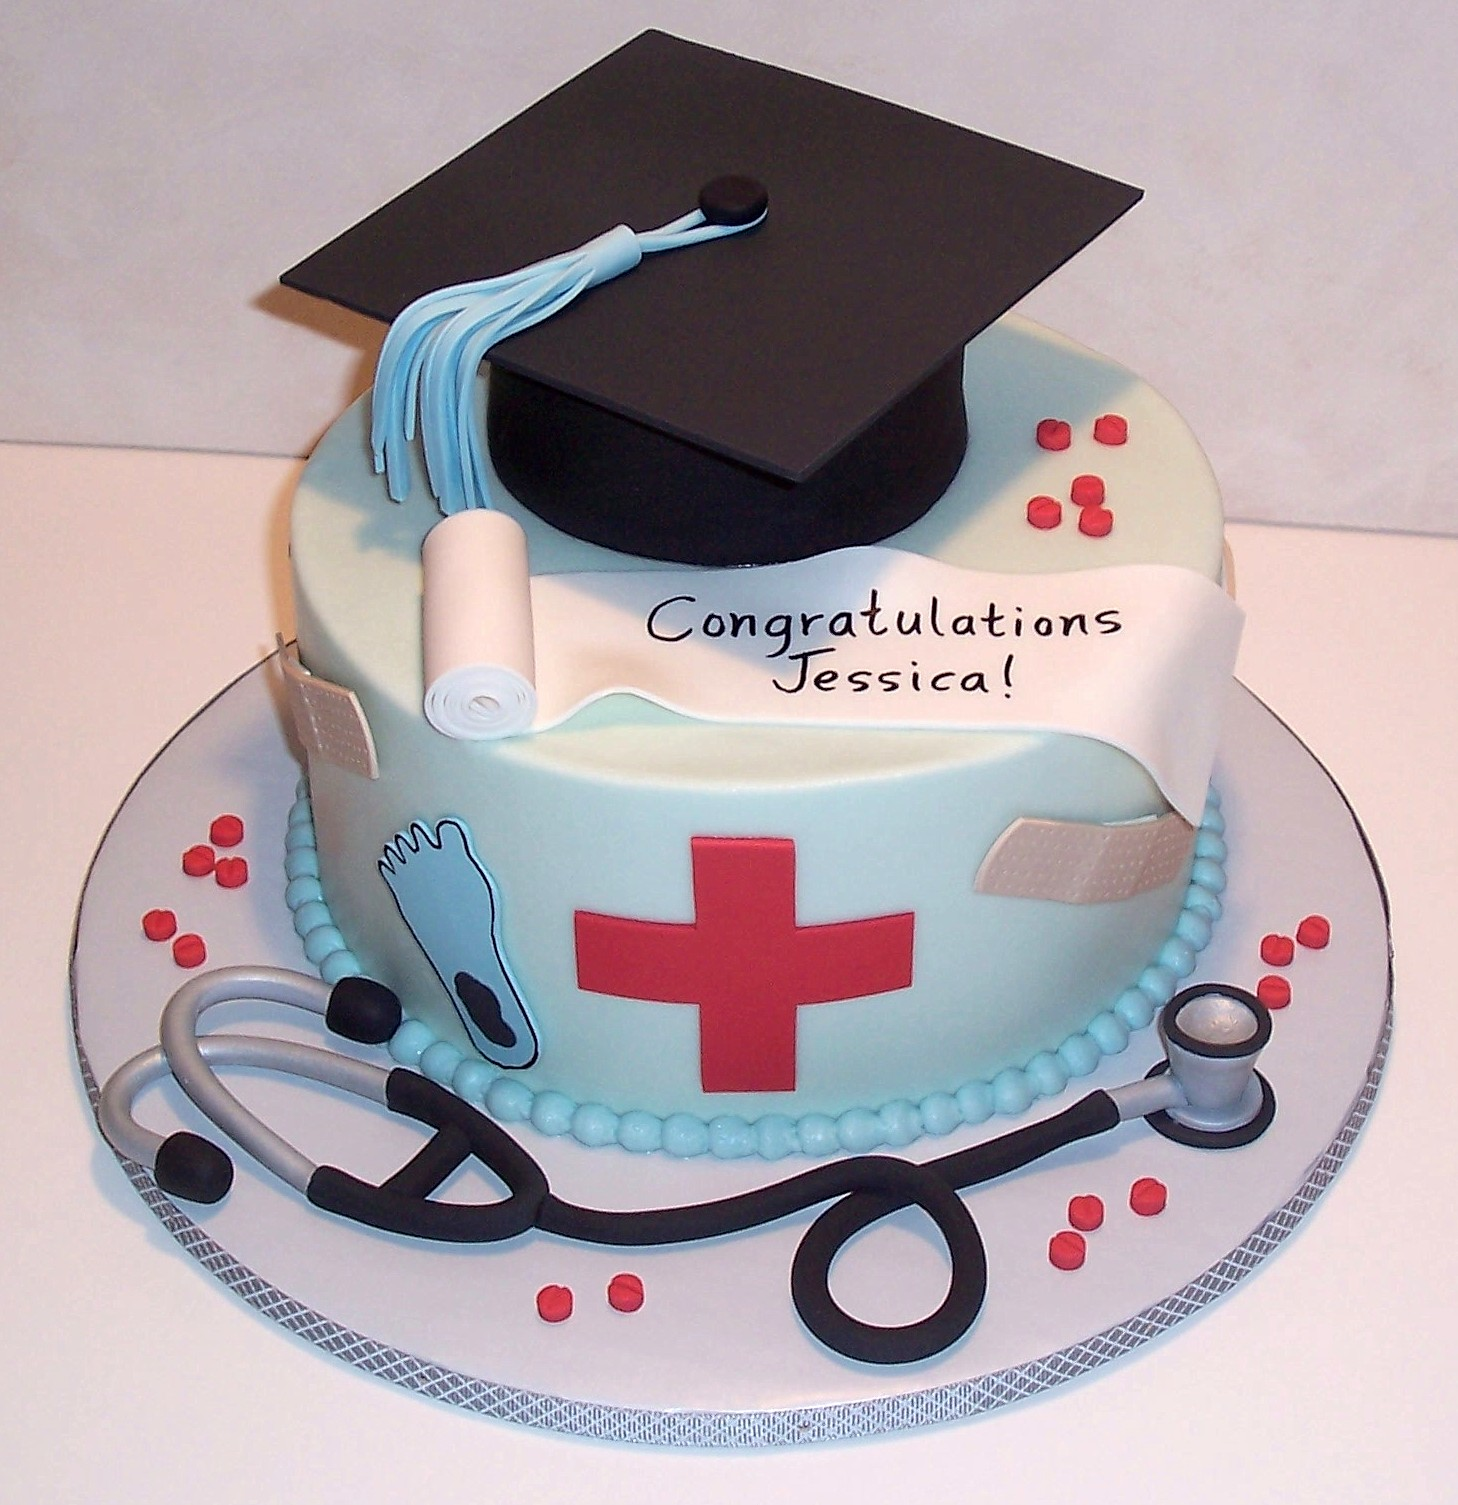 nurse+graduation birthday cakes for male doctors 8 on birthday cakes for male doctors